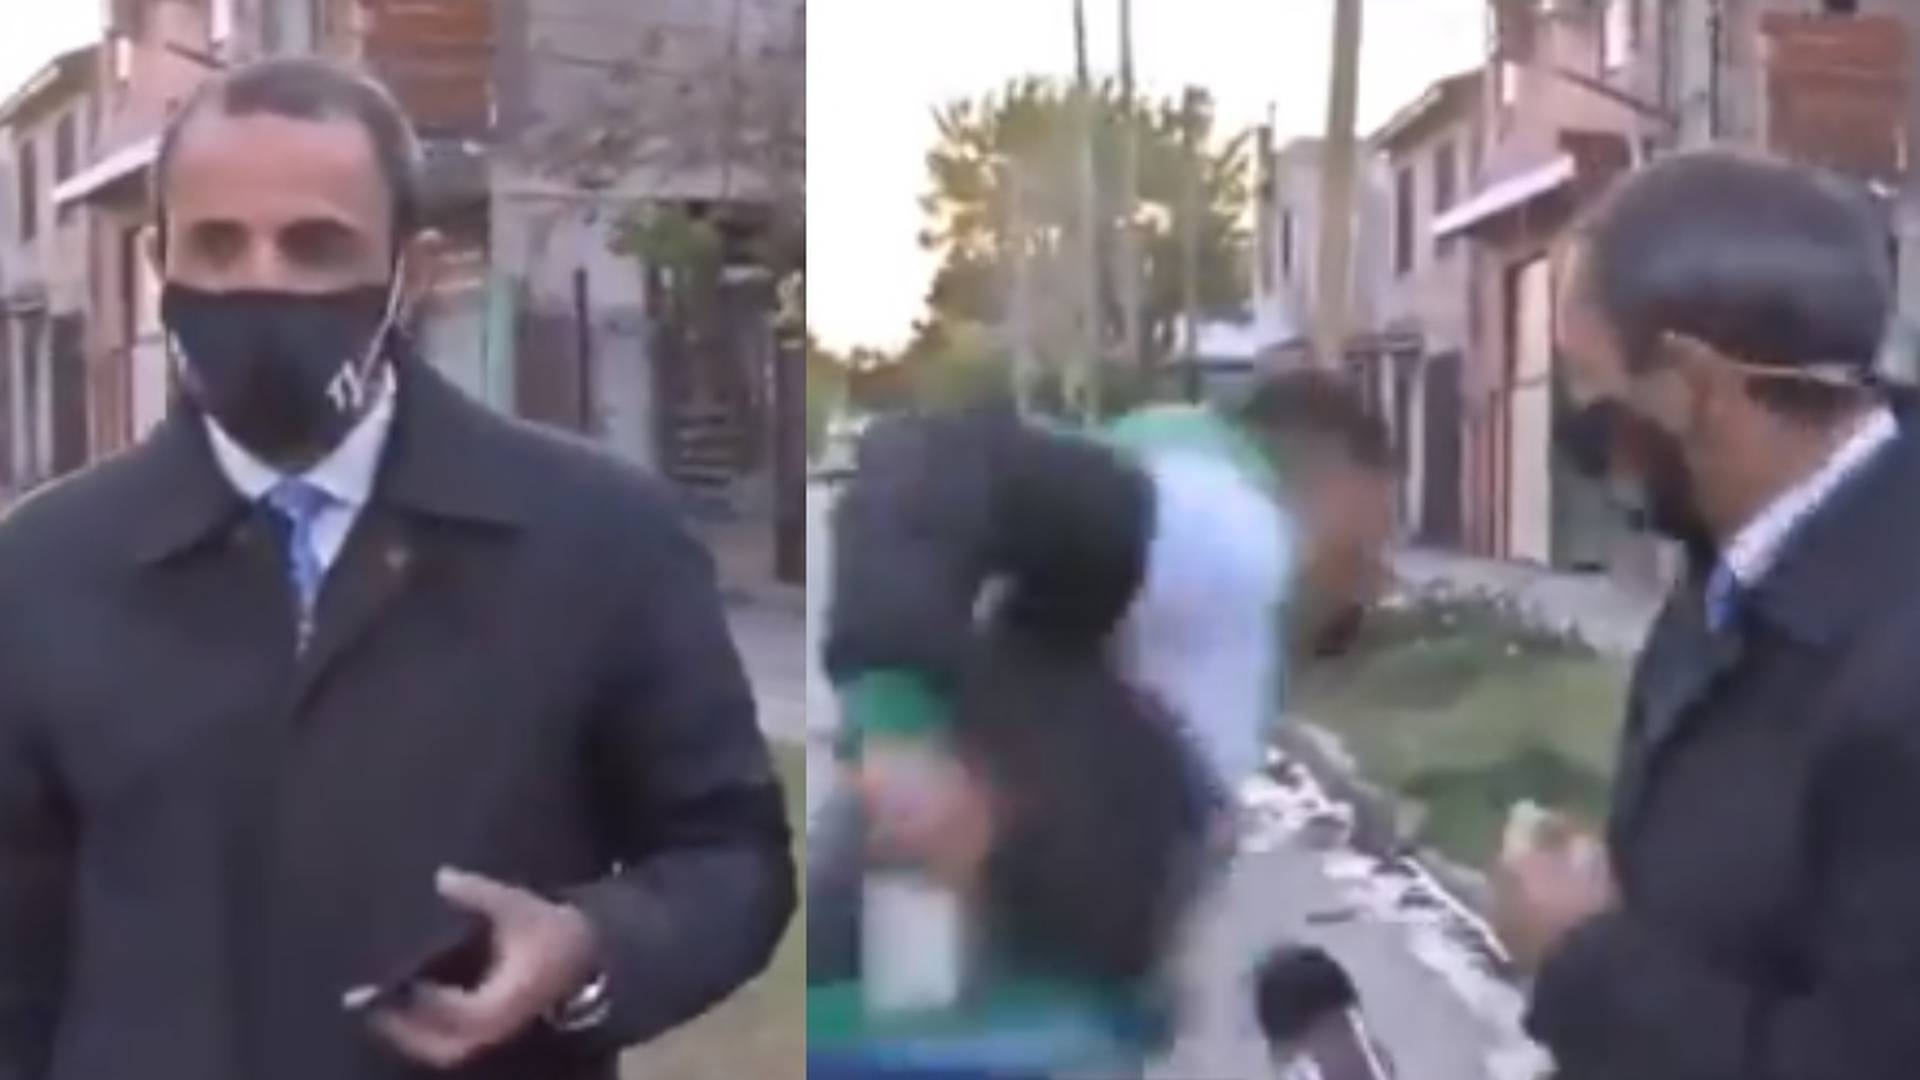 En video: el dramático robo de celular a periodista que esperaba salir al aire se vuelve viral